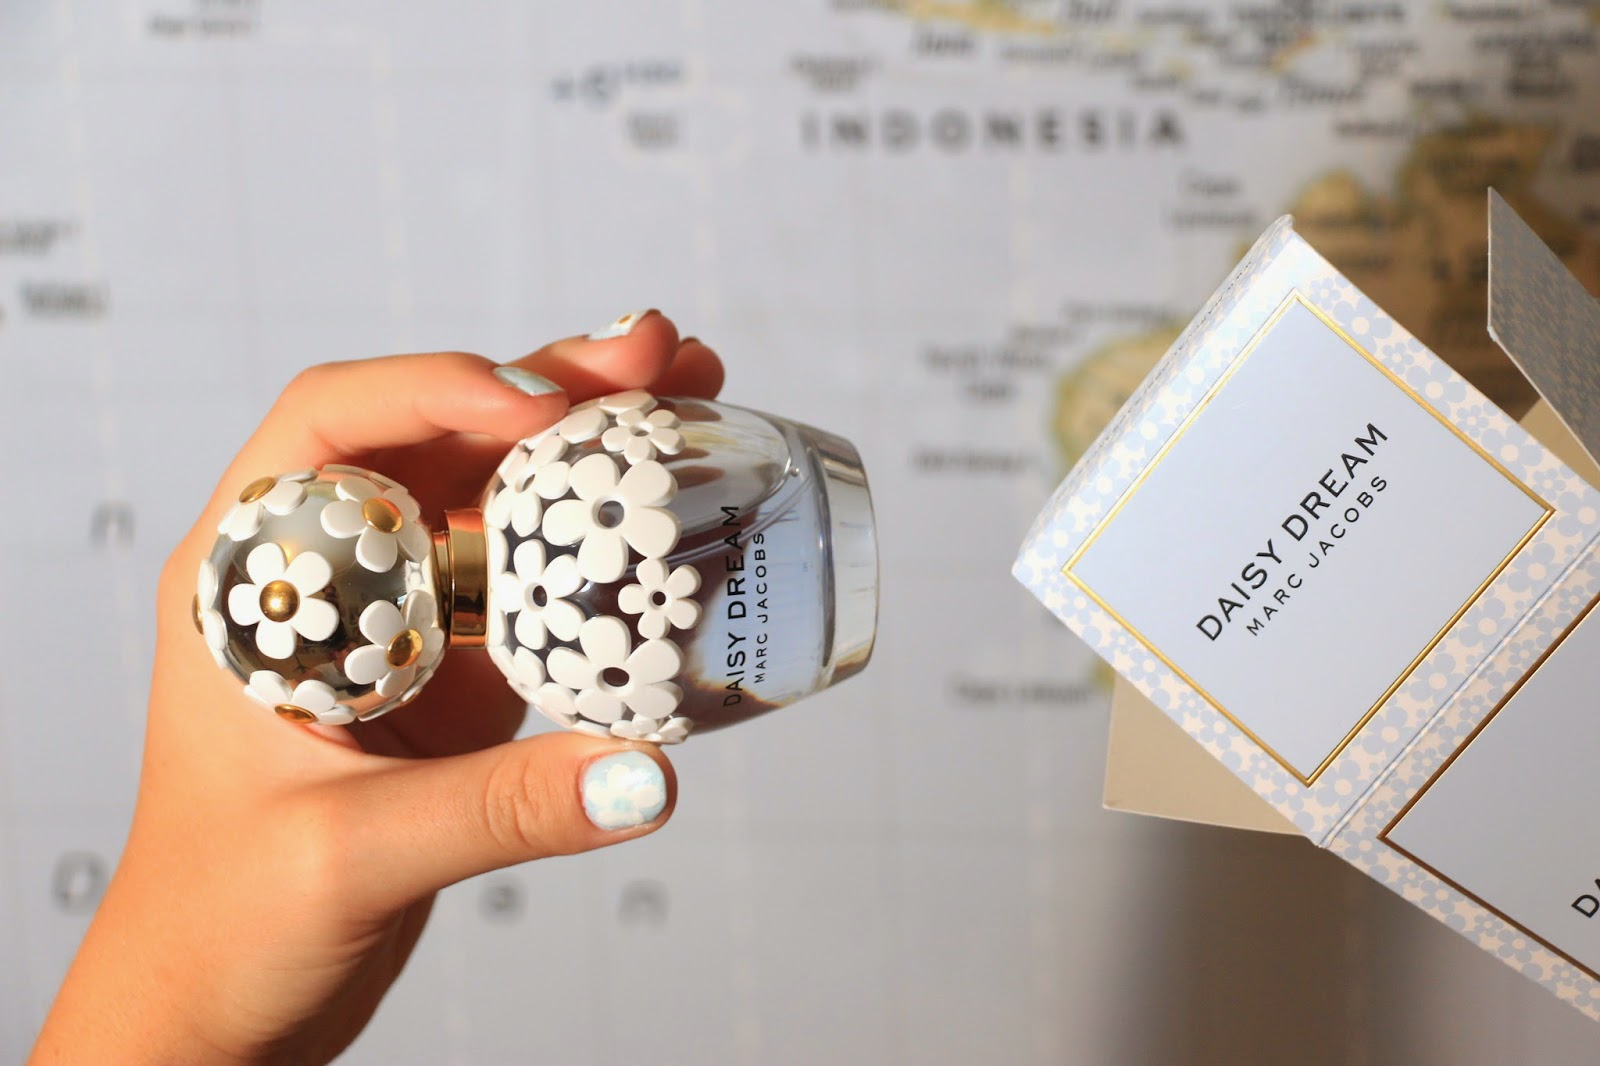 Marc Jacobs Daisy Dream, Summer Perfume, new perfume, parfum 2014